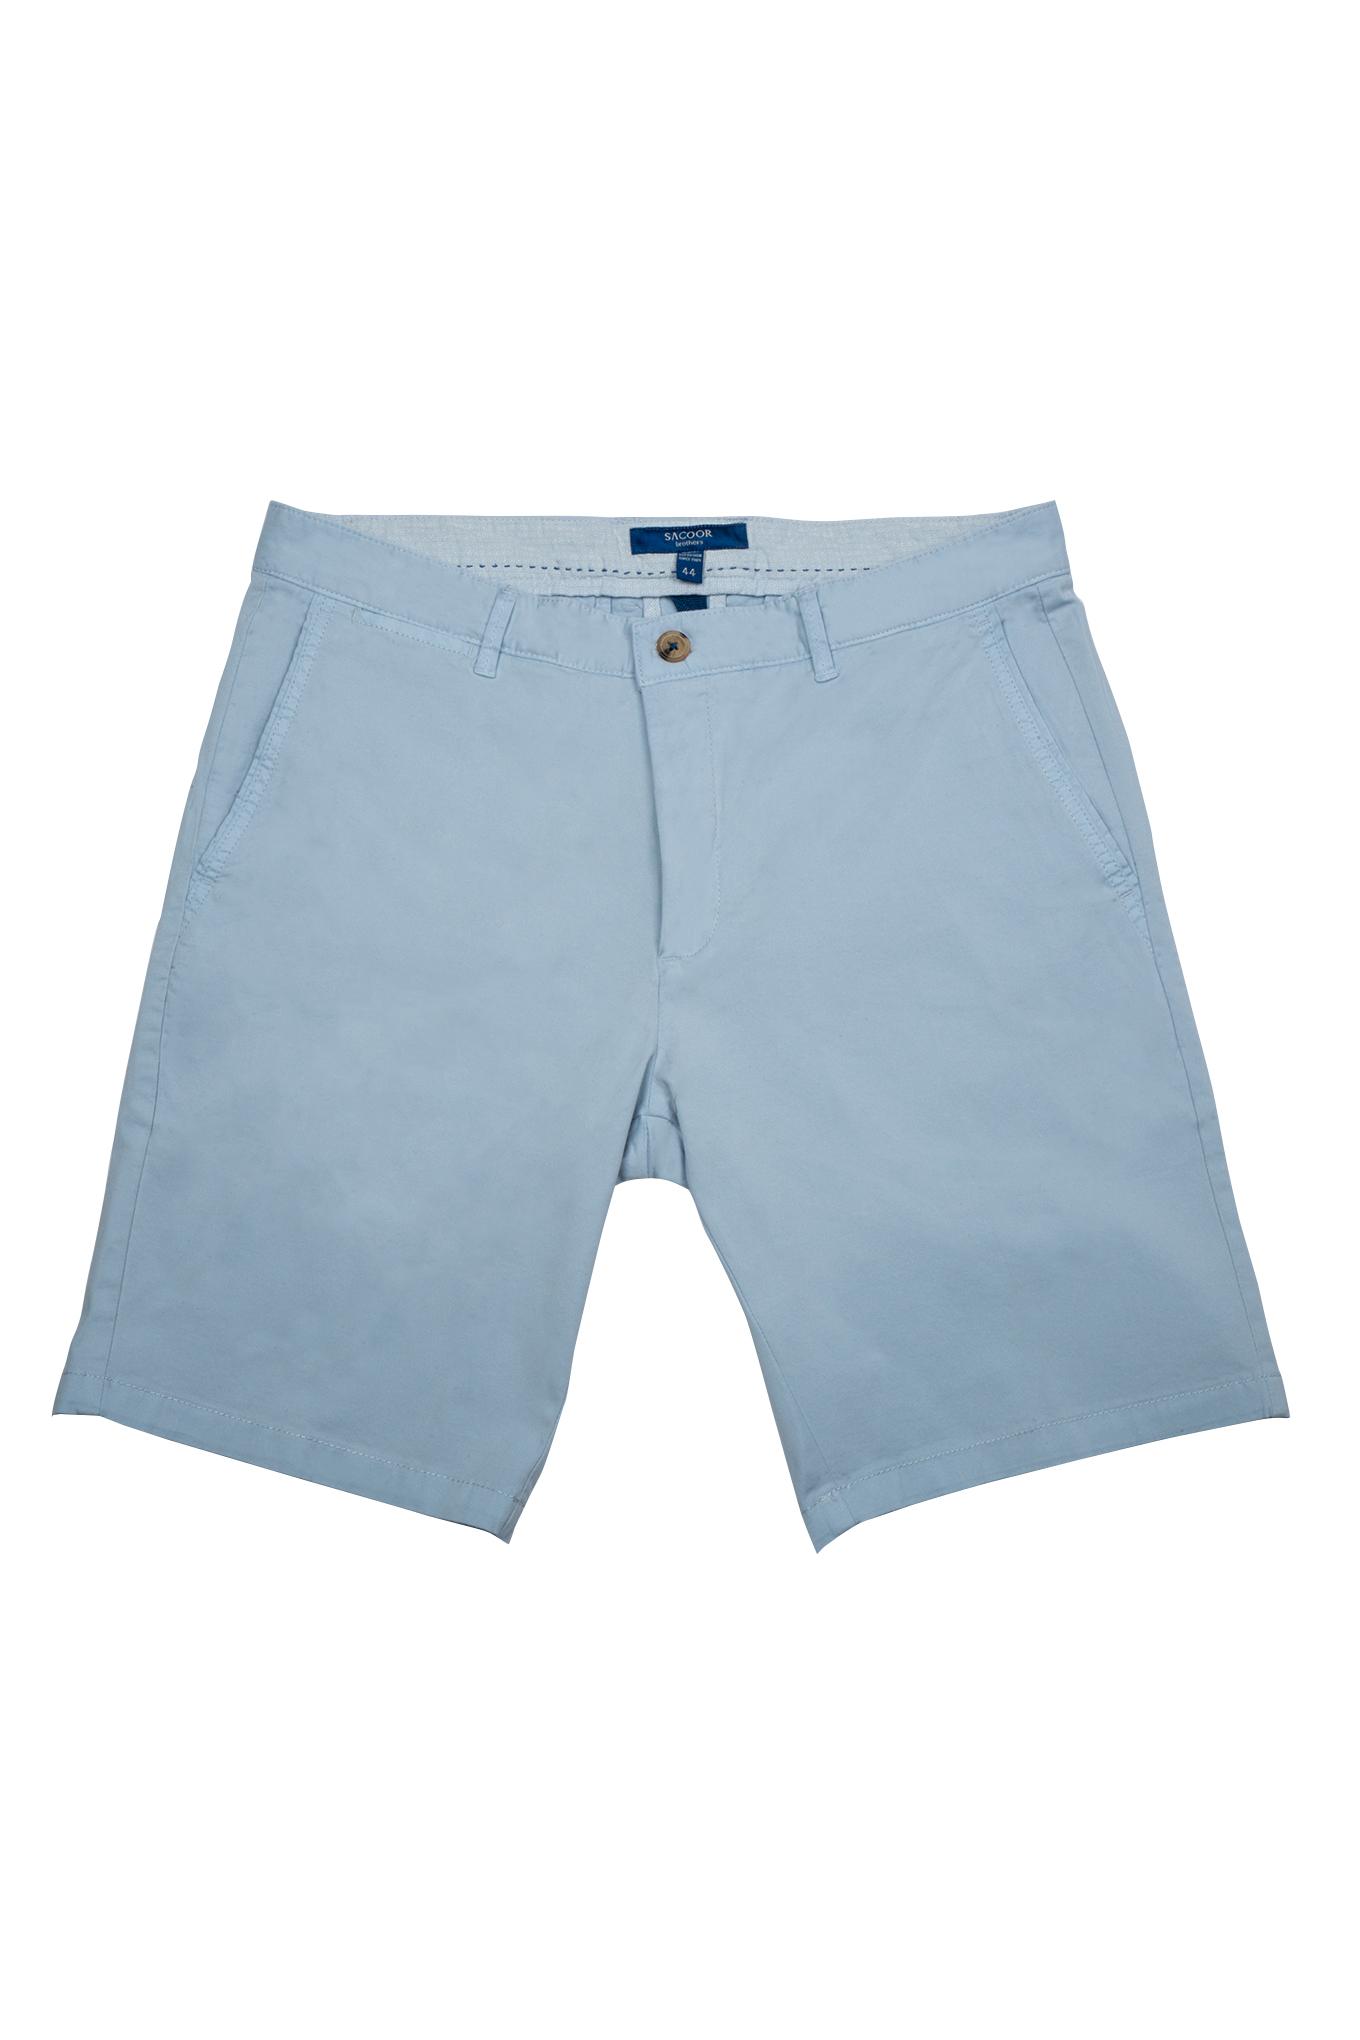 Bermuda Azul Claro Casual Homem